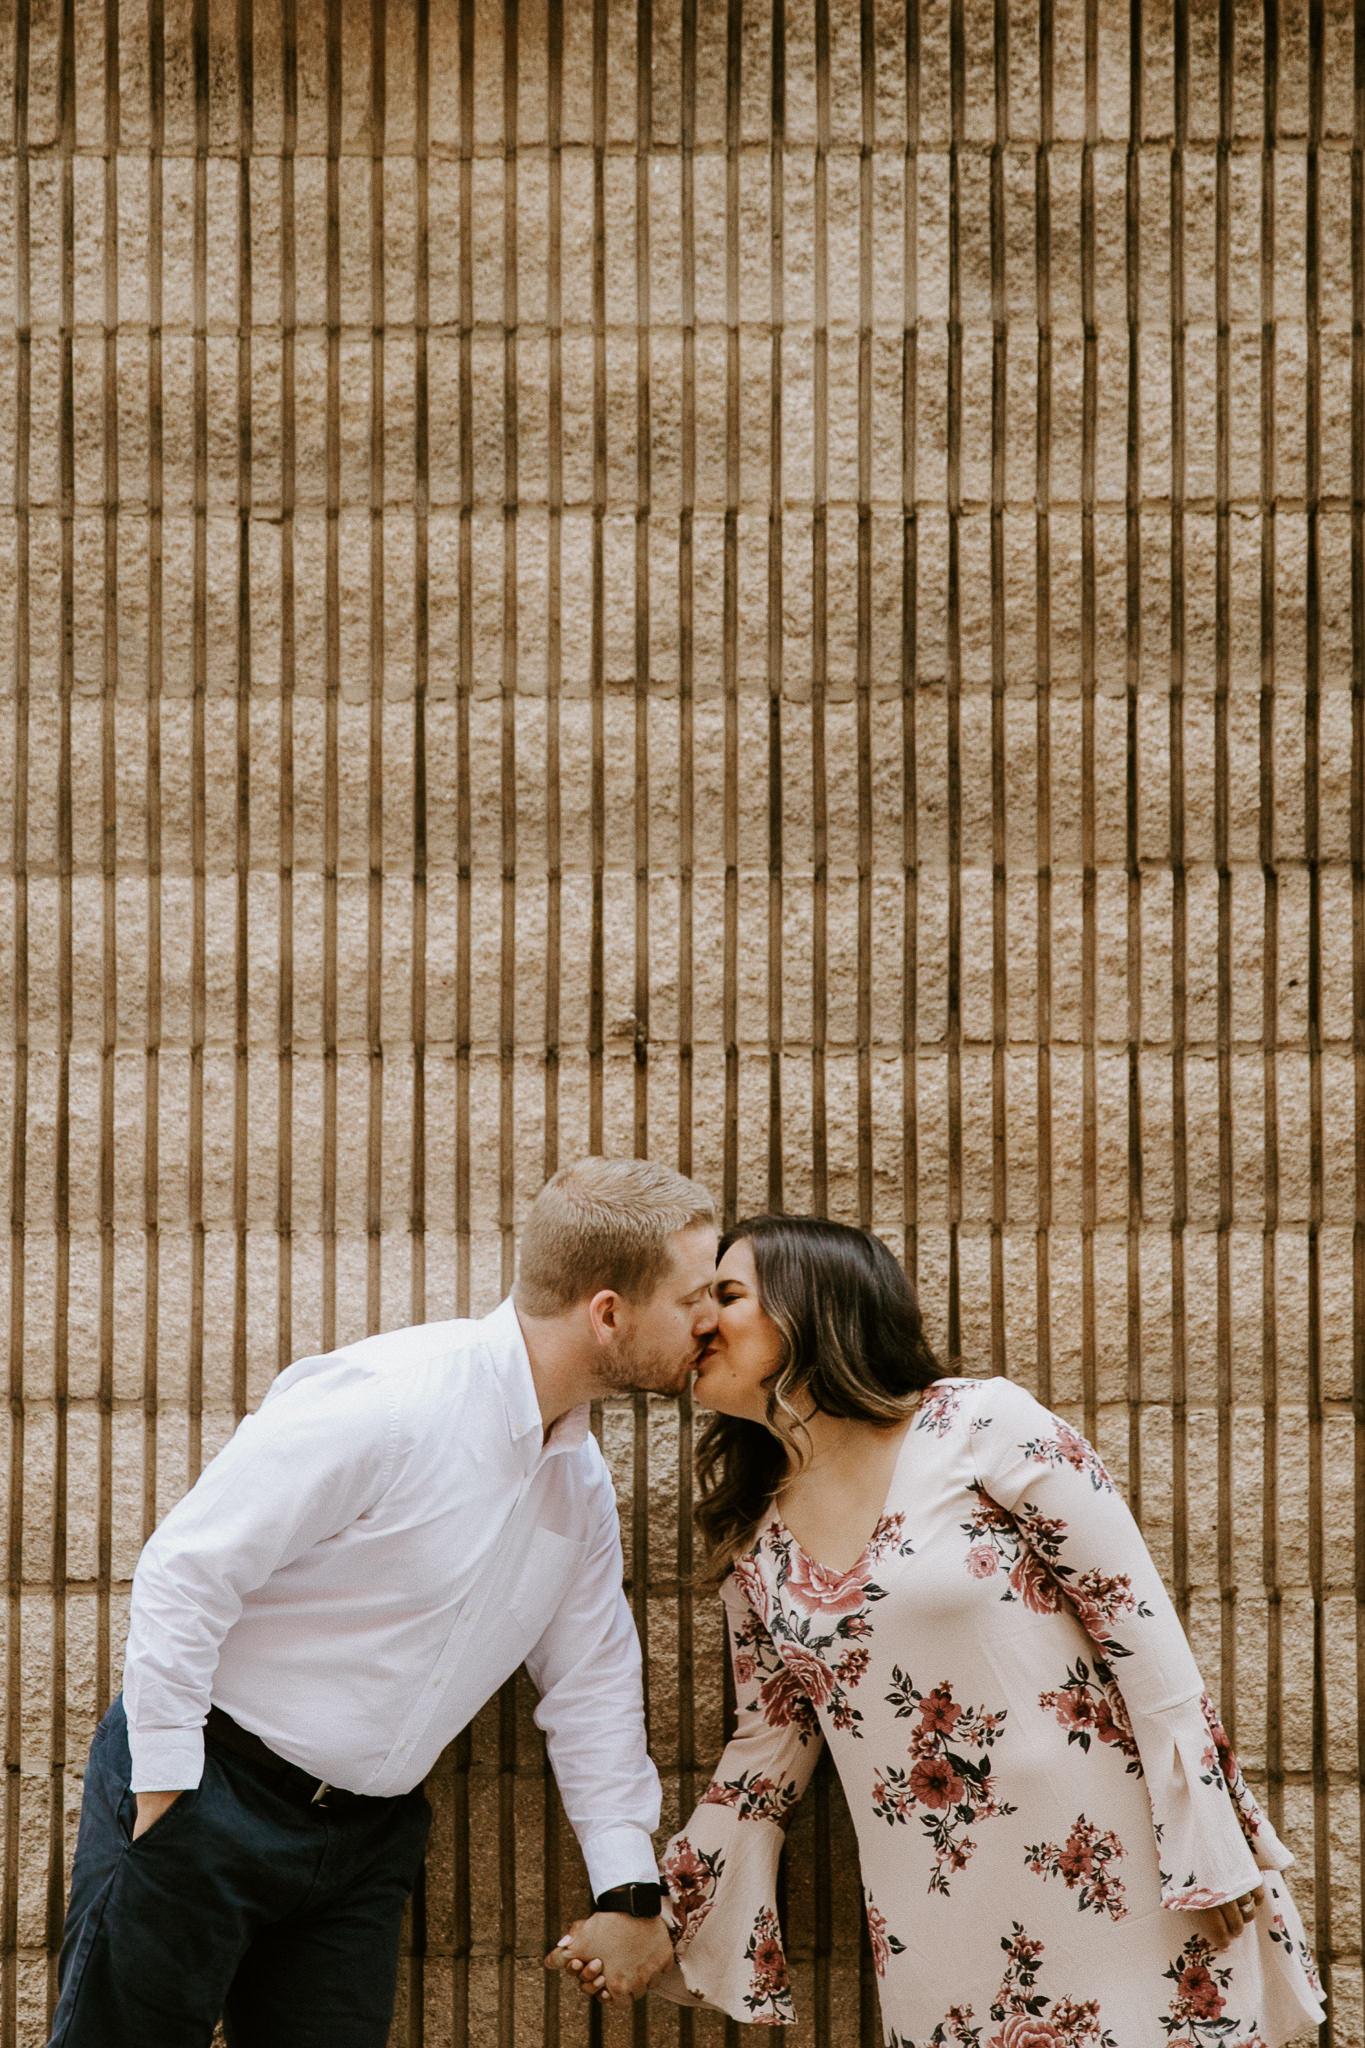 Engagement - Downtown Roanoke -  Wedding Photographer - Virginia - Best - Pat Cori Photography-7.jpg